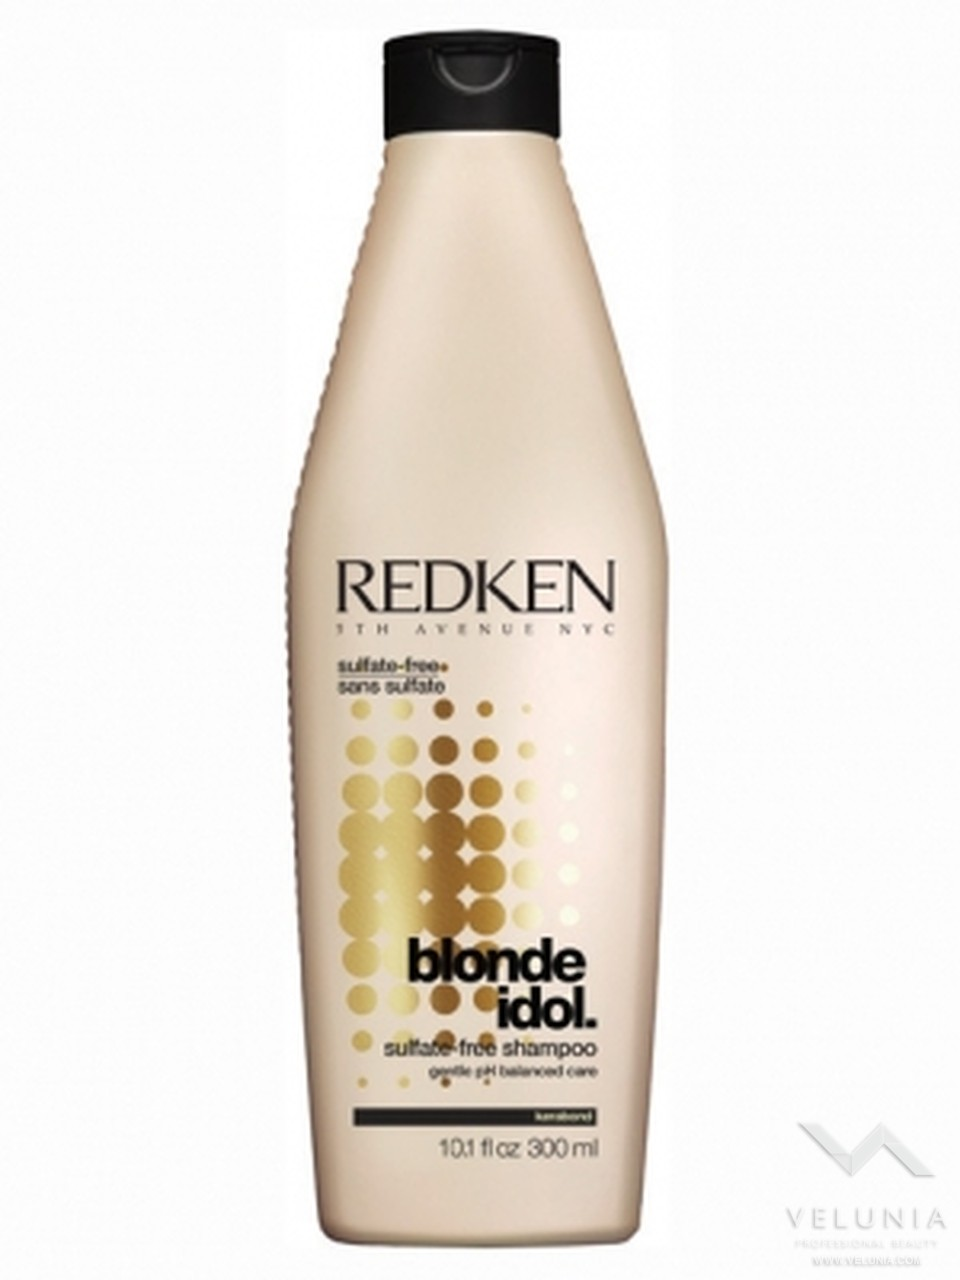 Redken Blonde idol shampoo 300 ml 1